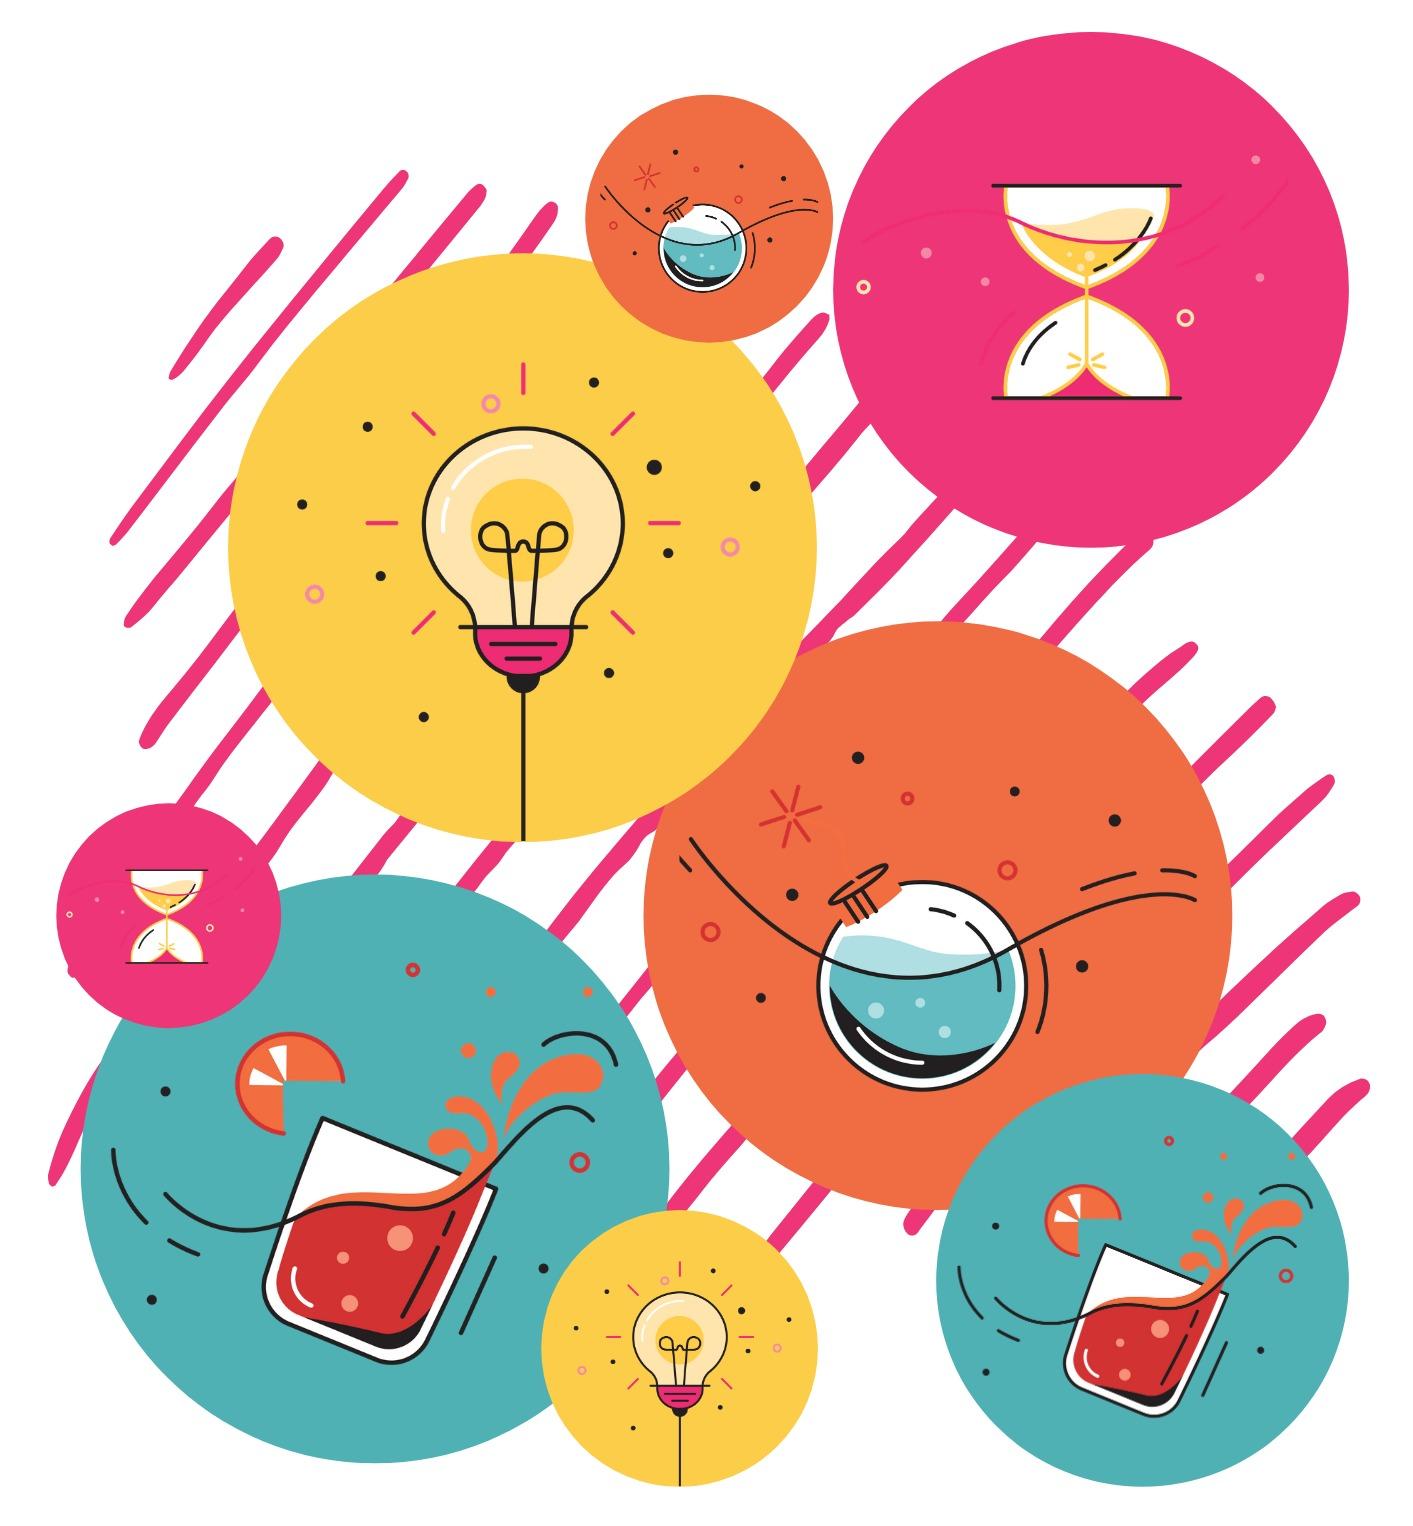 spolocenskaterapia.sk-spolocenska-terapia-spolocenska-hra-zabava-kartova-hra-spolocenska-hra-karty-karticky-hracie-karty-kategoria-ikonky-pozadie